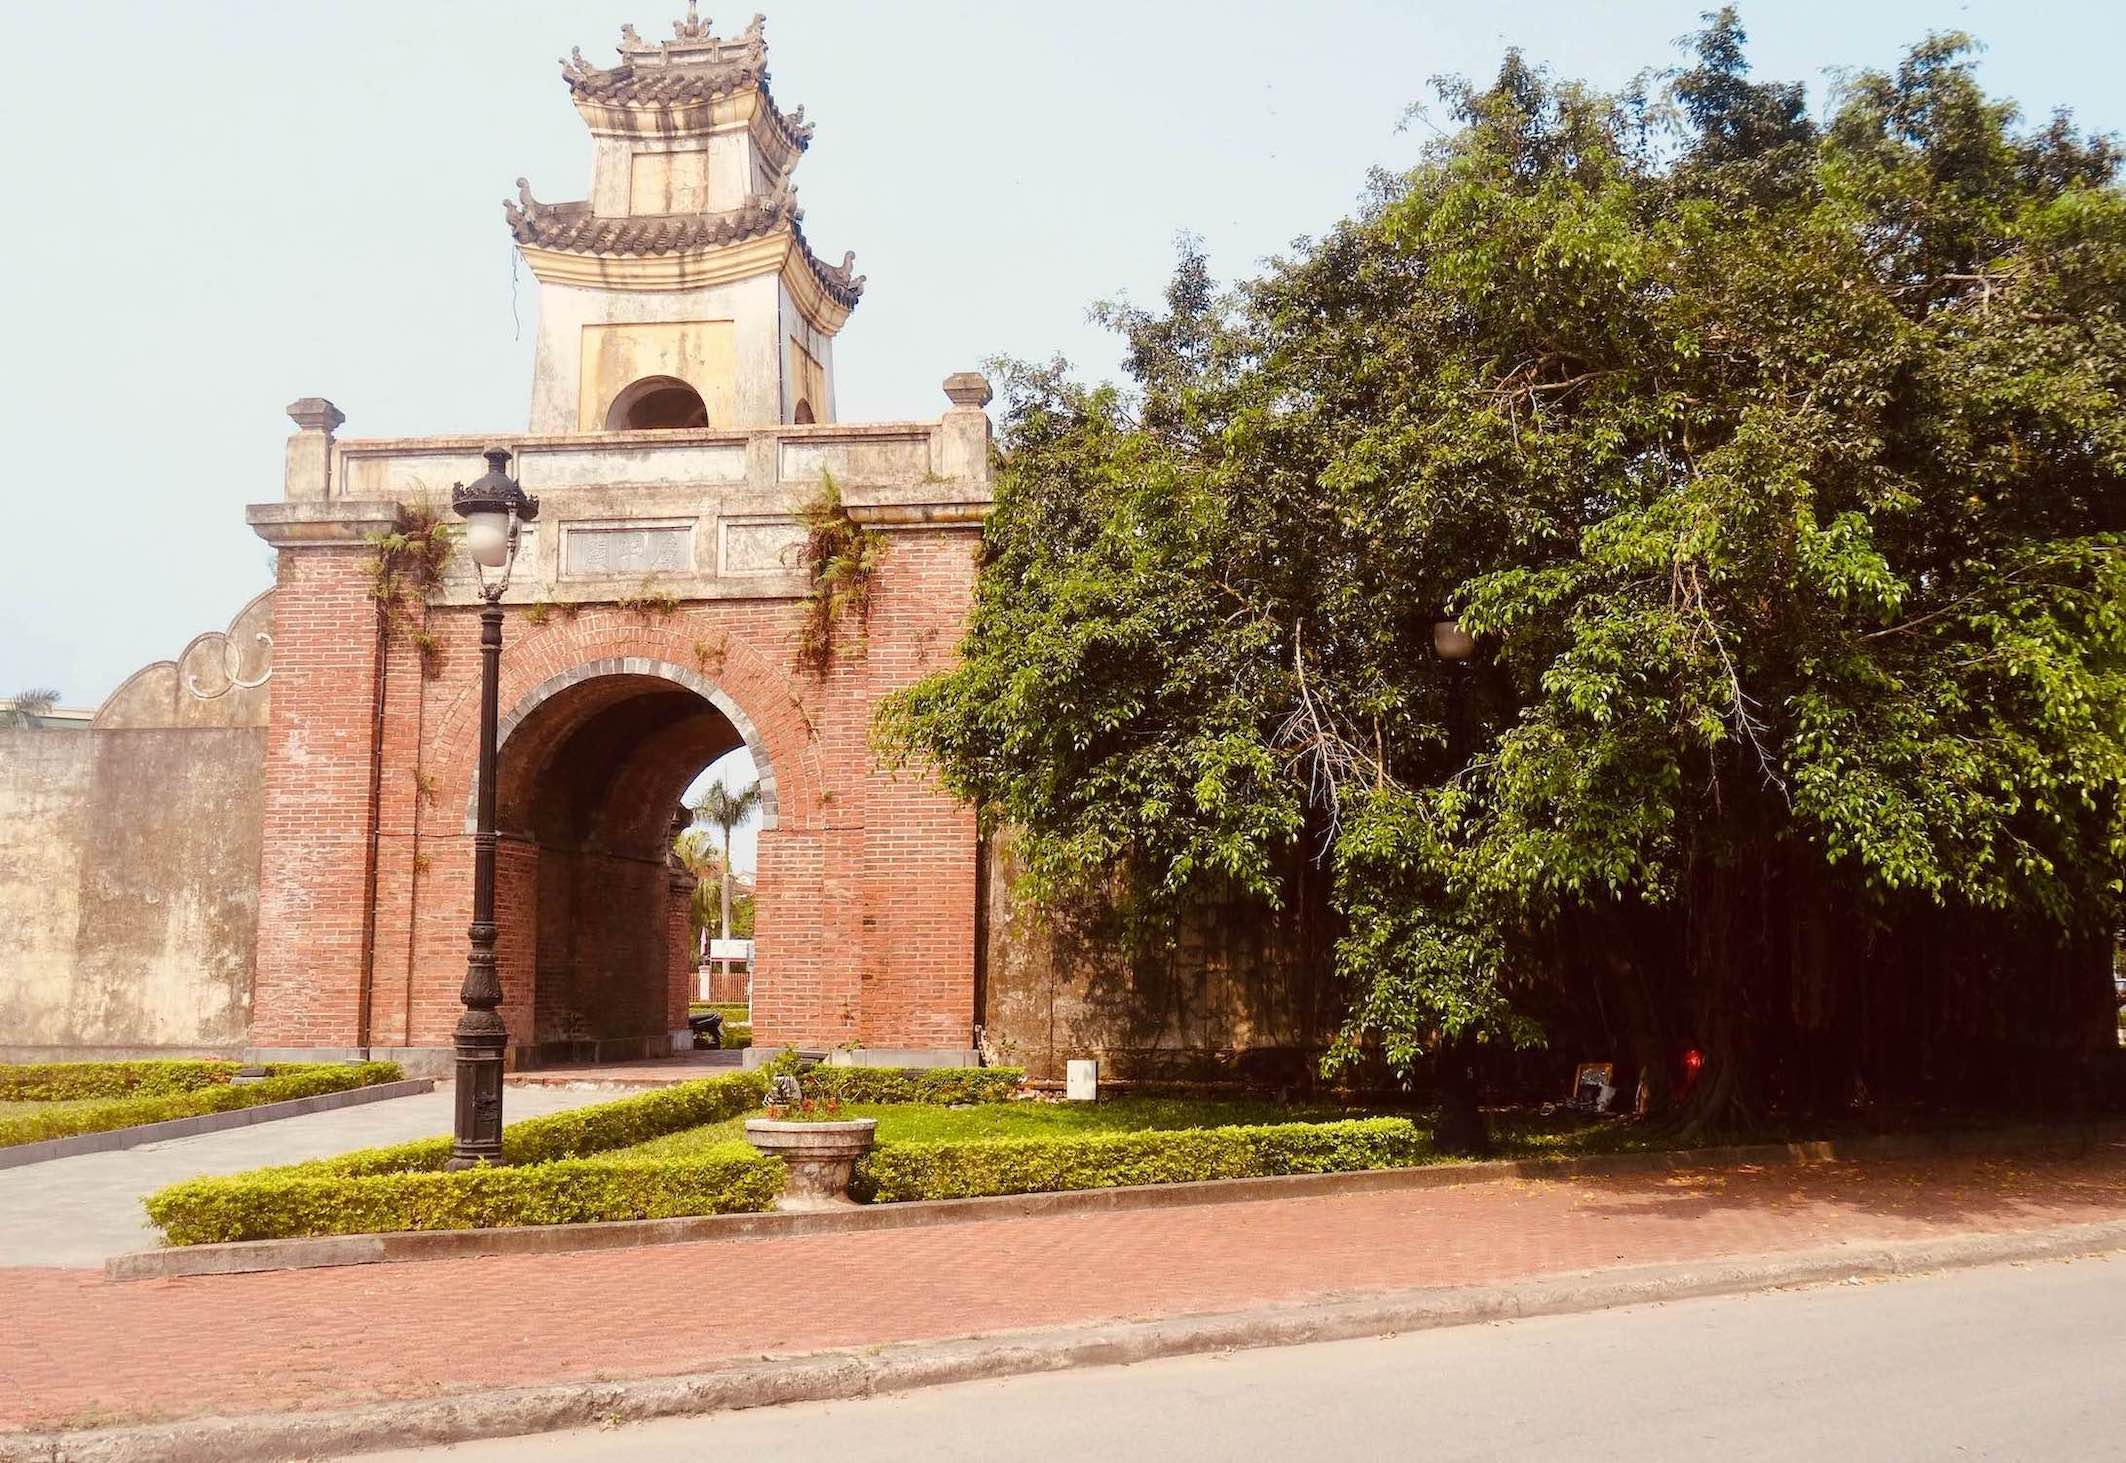 Citadel gate Dong Hoi Vietnam.